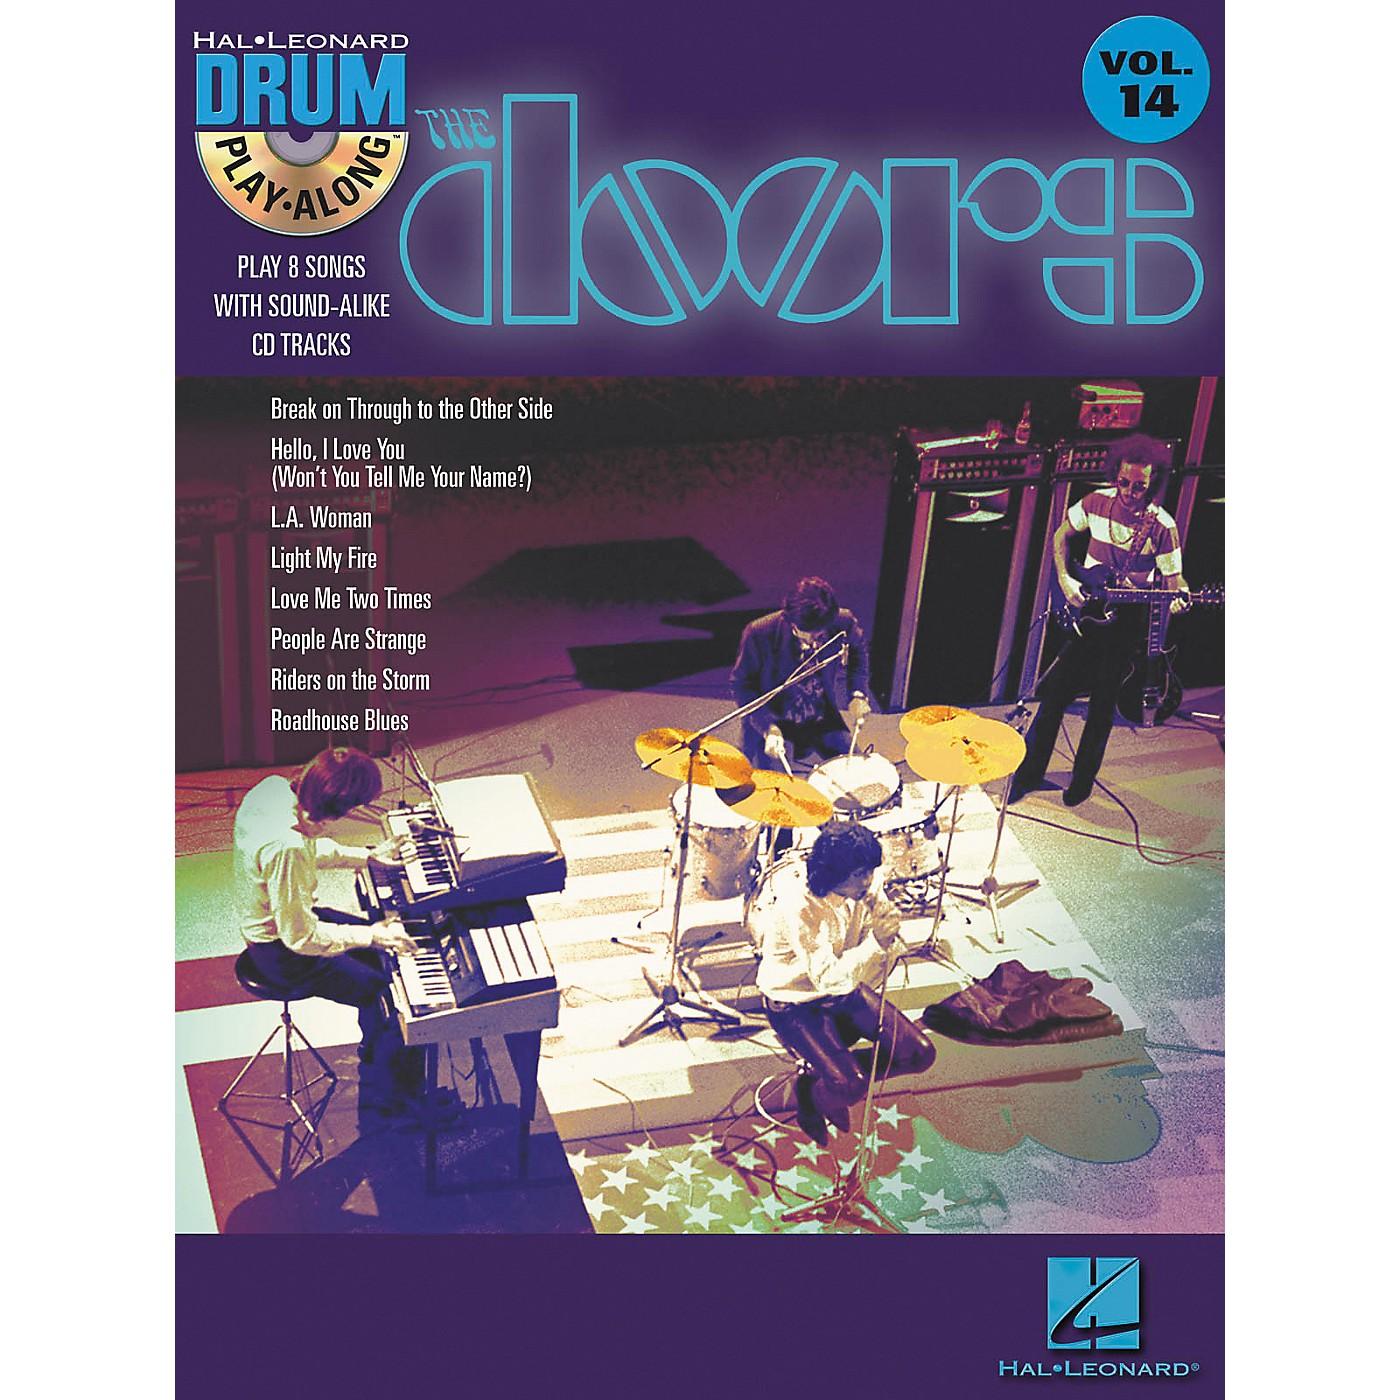 Hal Leonard The Doors - Drum Play-Along Volume 14 Book/CD Set thumbnail